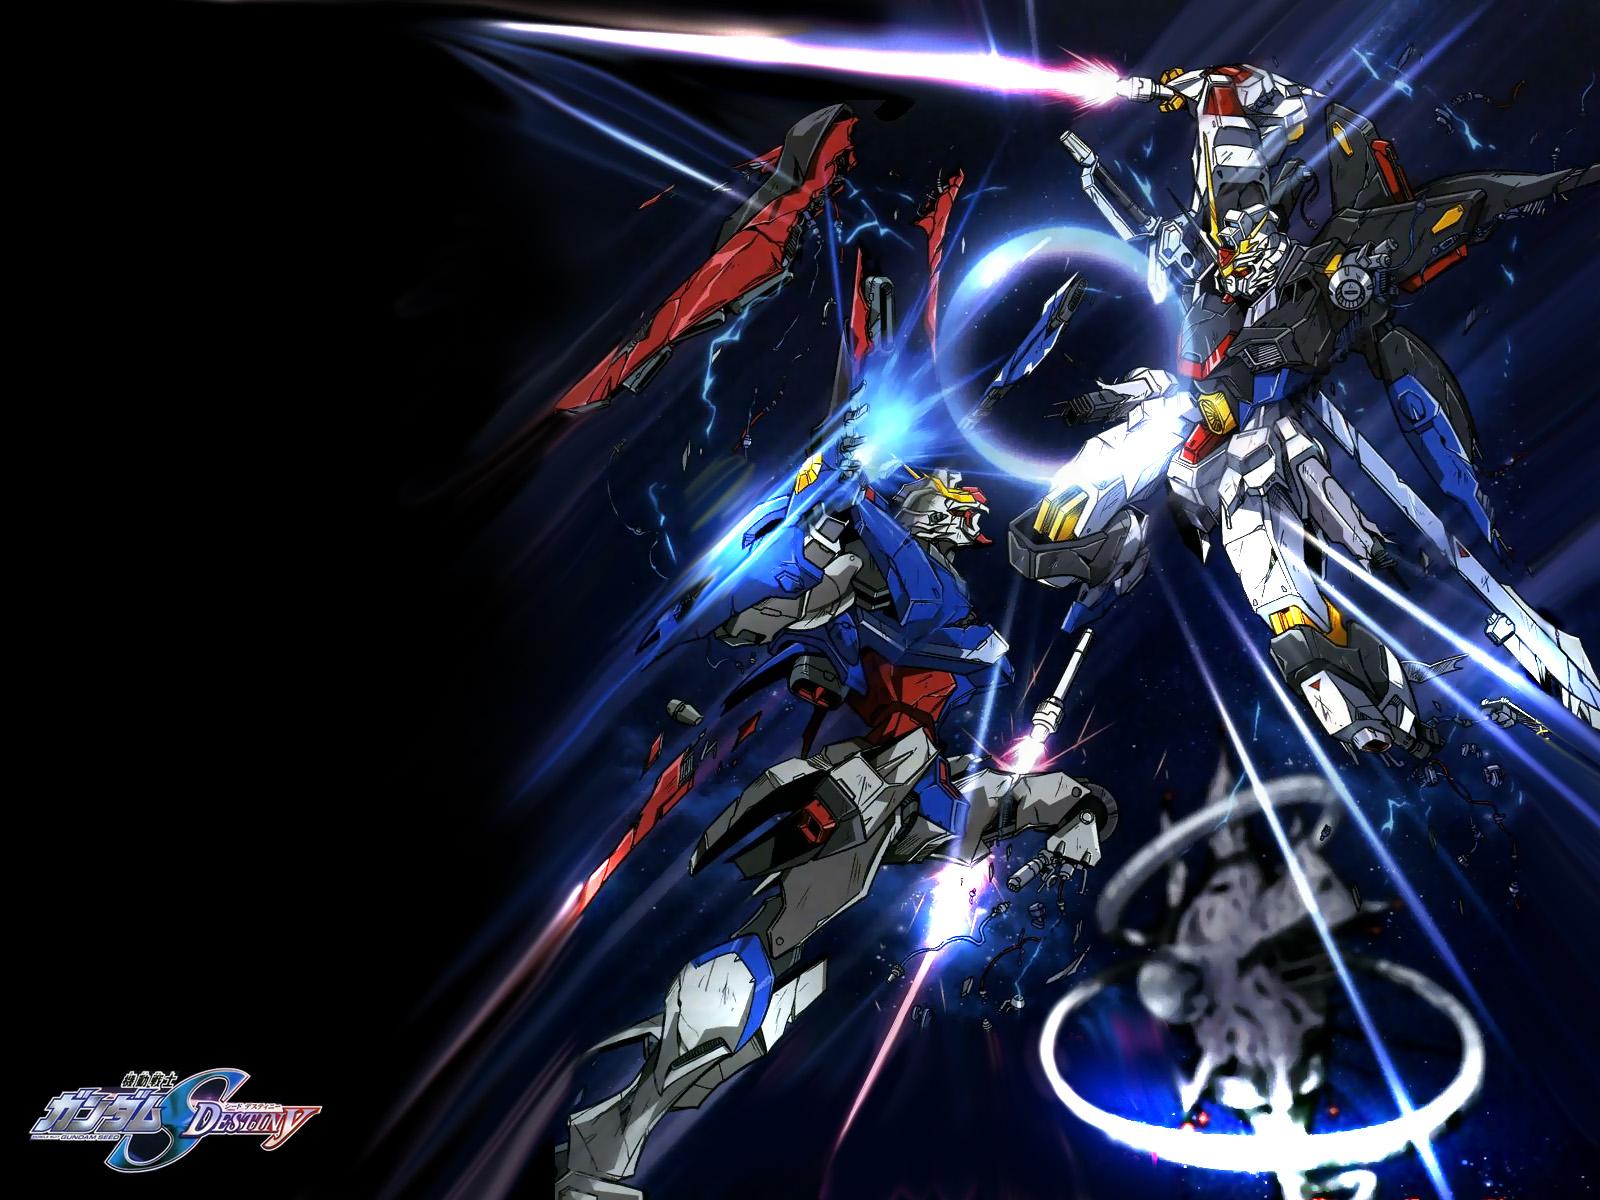 Gundam SEED Destiny Wallpapers   Gundam Kits Collection 1600x1200